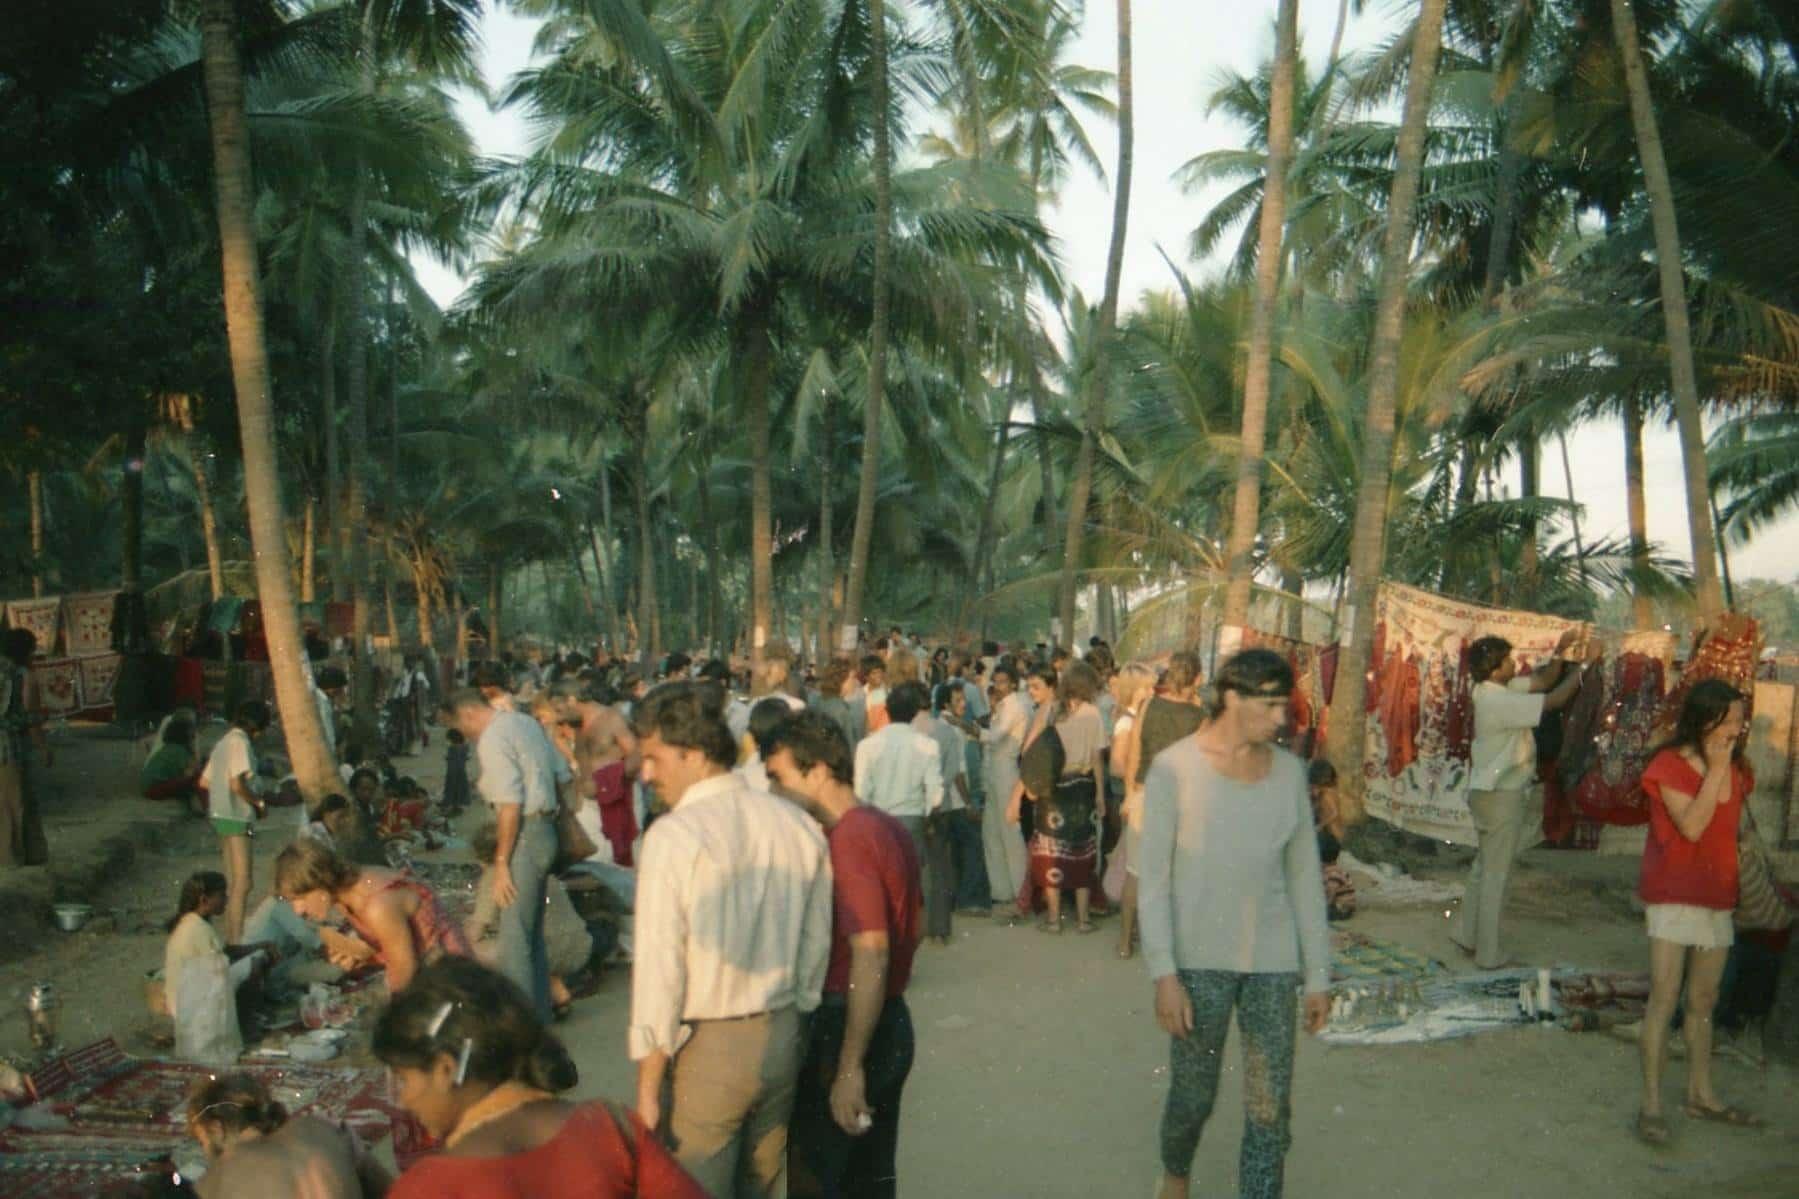 Flea market, Anjuna, Goa, 1982 (Photo by Piers Ciappara).